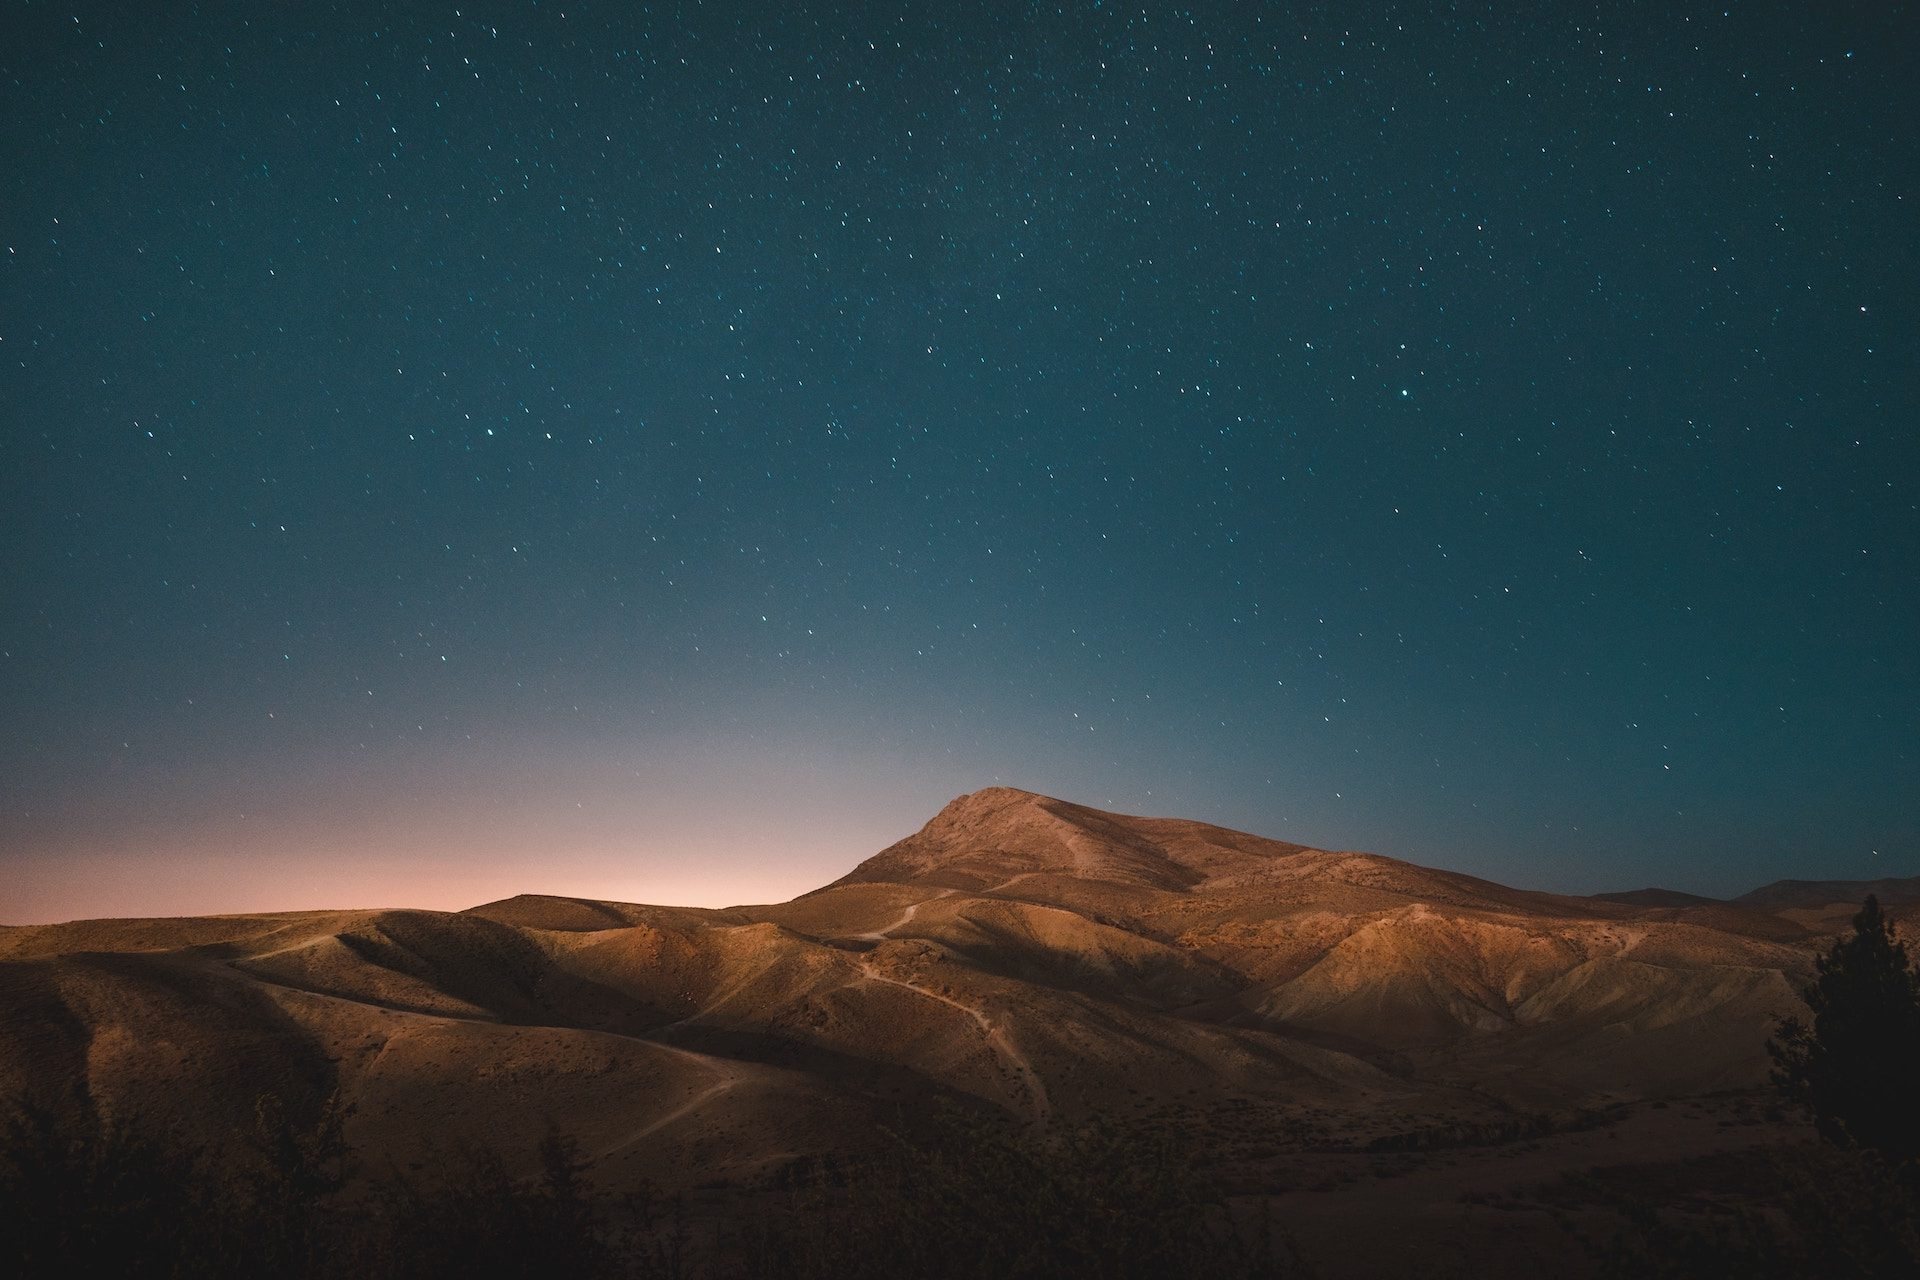 Montañas, 小山, 沙漠, 晚上, 星级, 天空, 马什哈德, 伊朗 - 高清壁纸 - 教授-falken.com